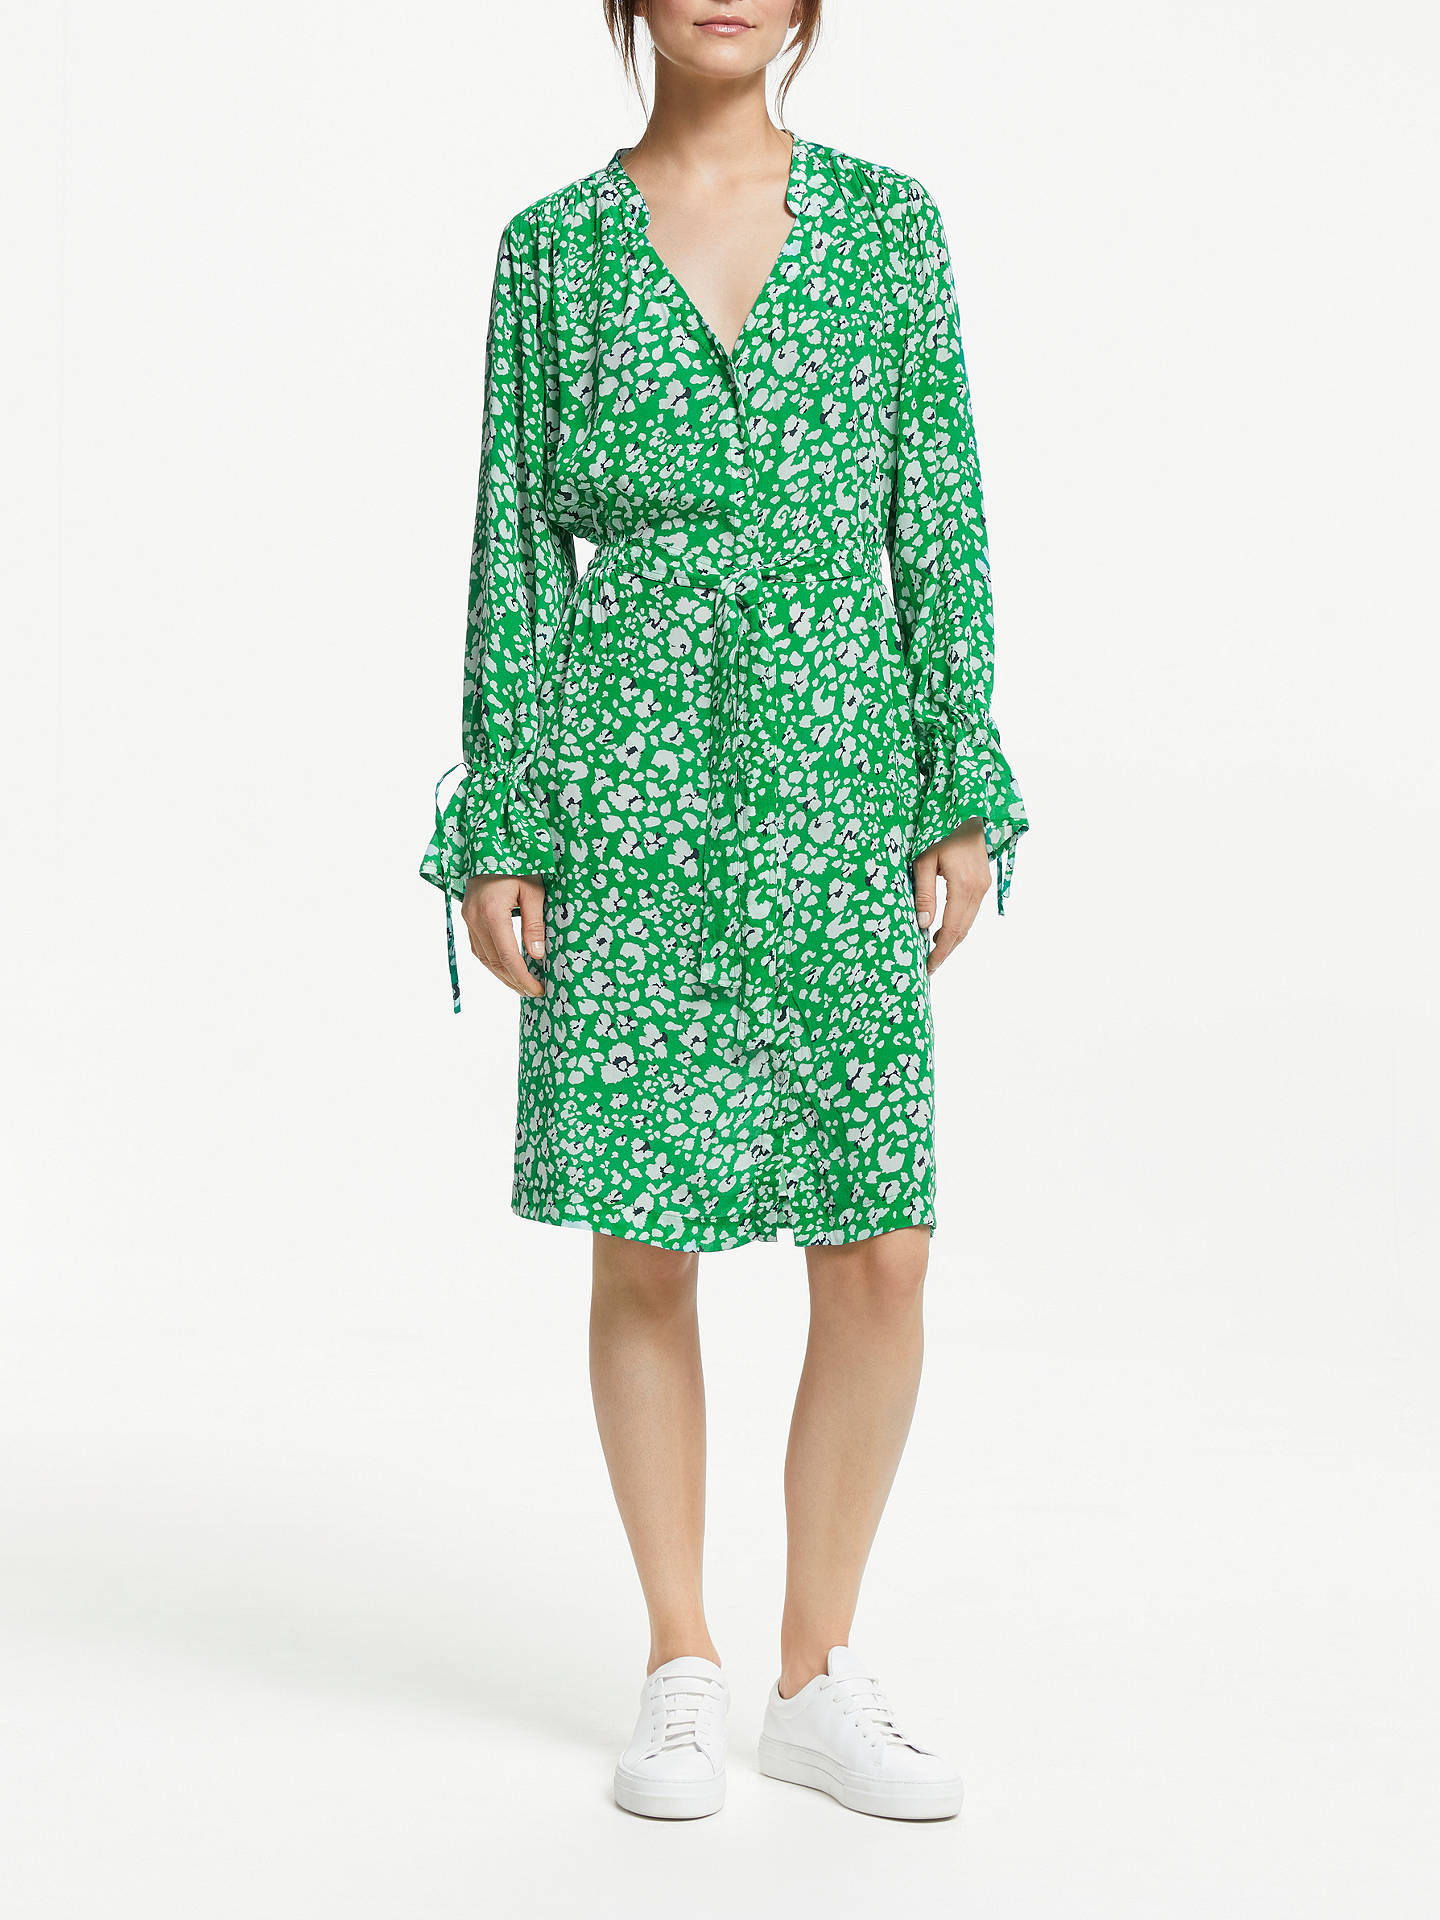 9fd6ea8f17 BuyPyrus Frankie Animal Print Dress